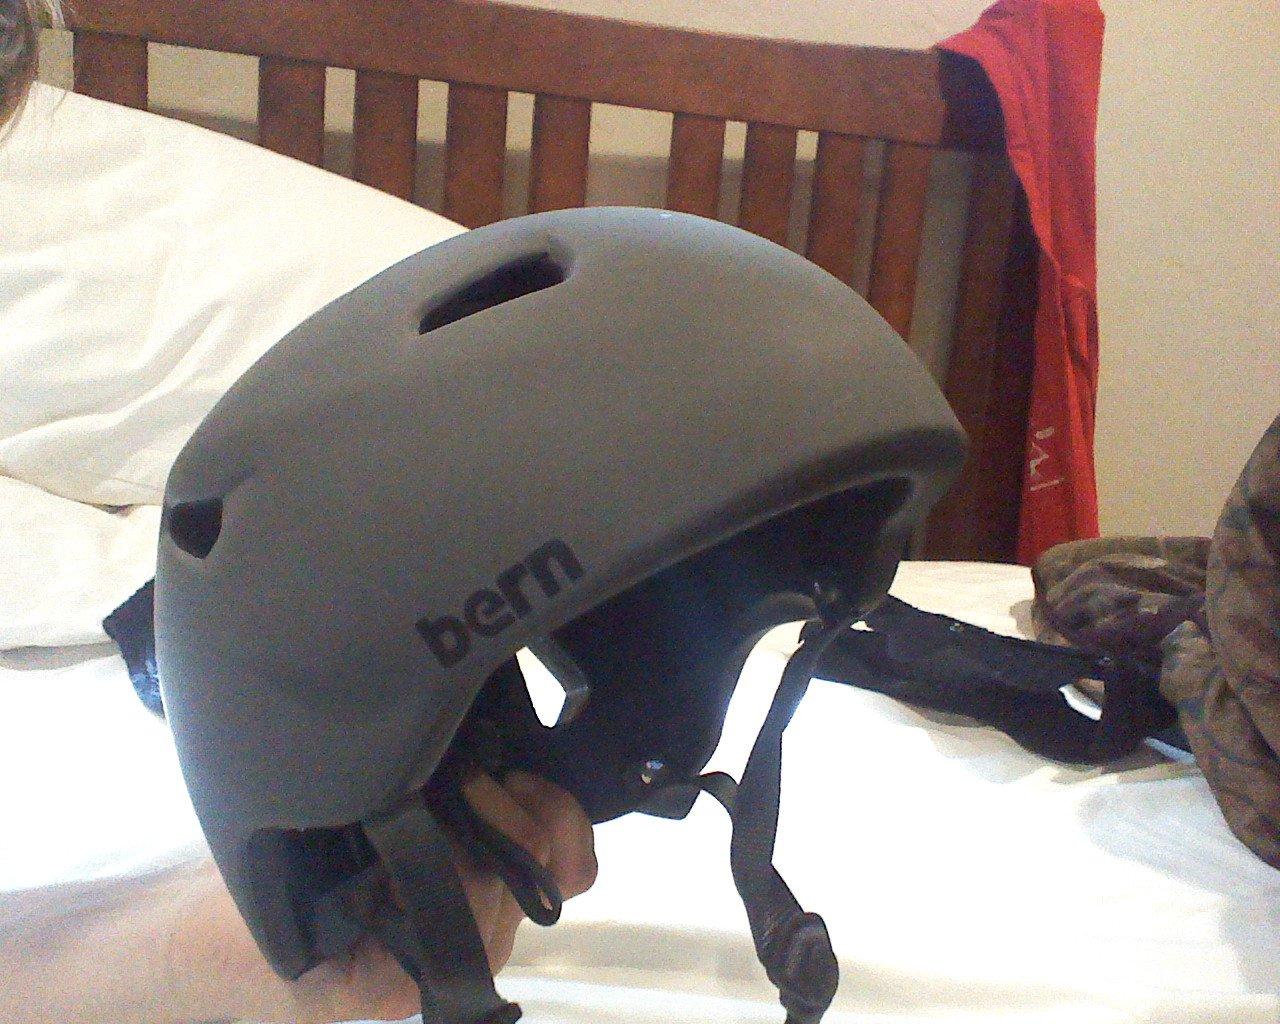 Helmetscott1